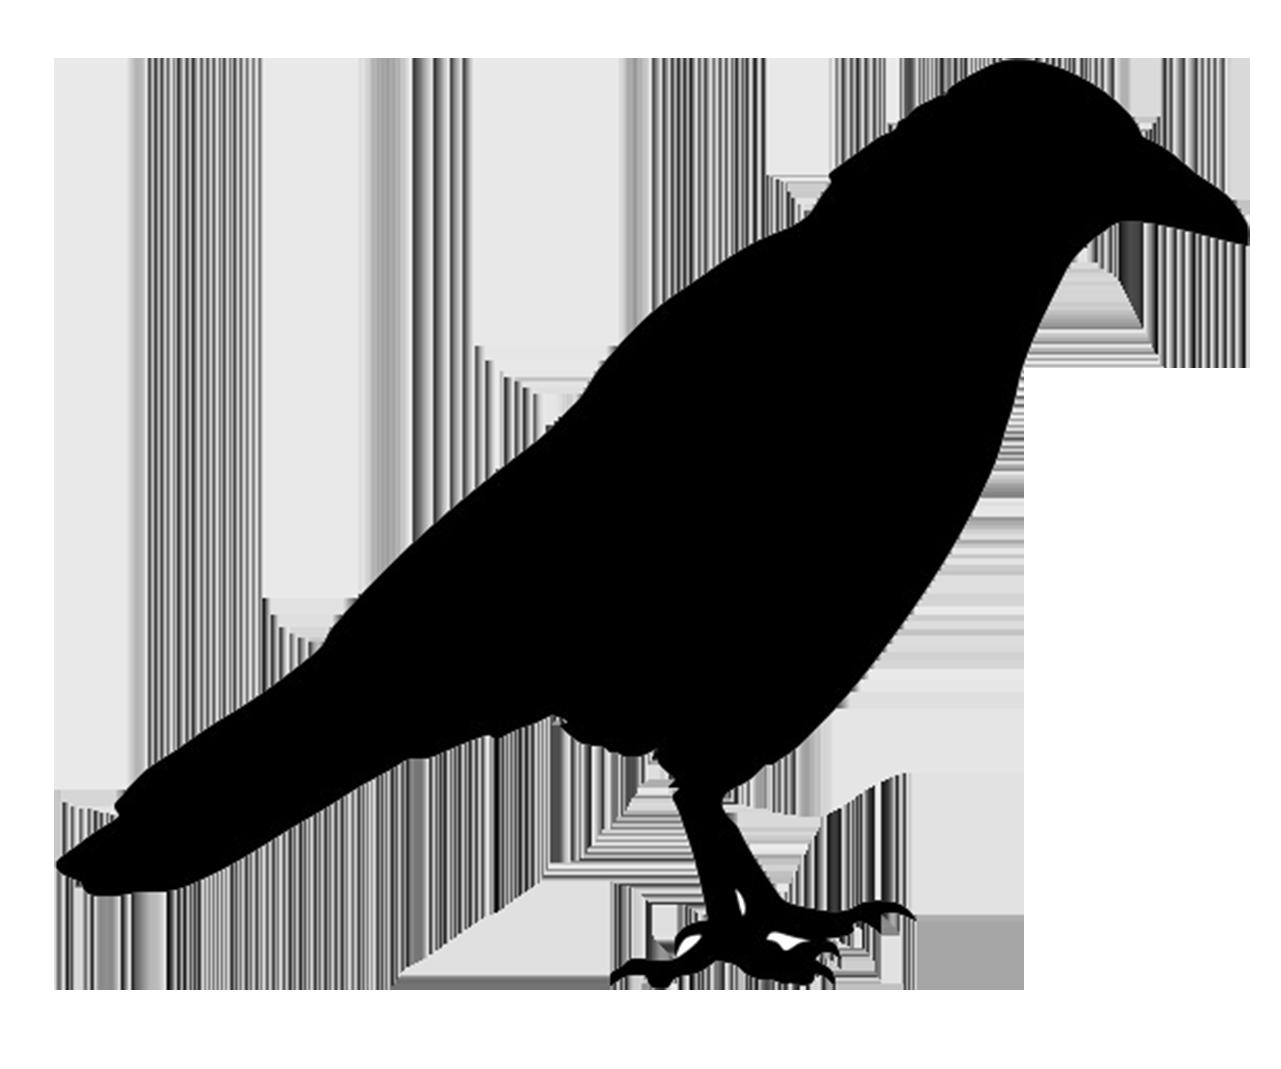 jackdaw silhouette